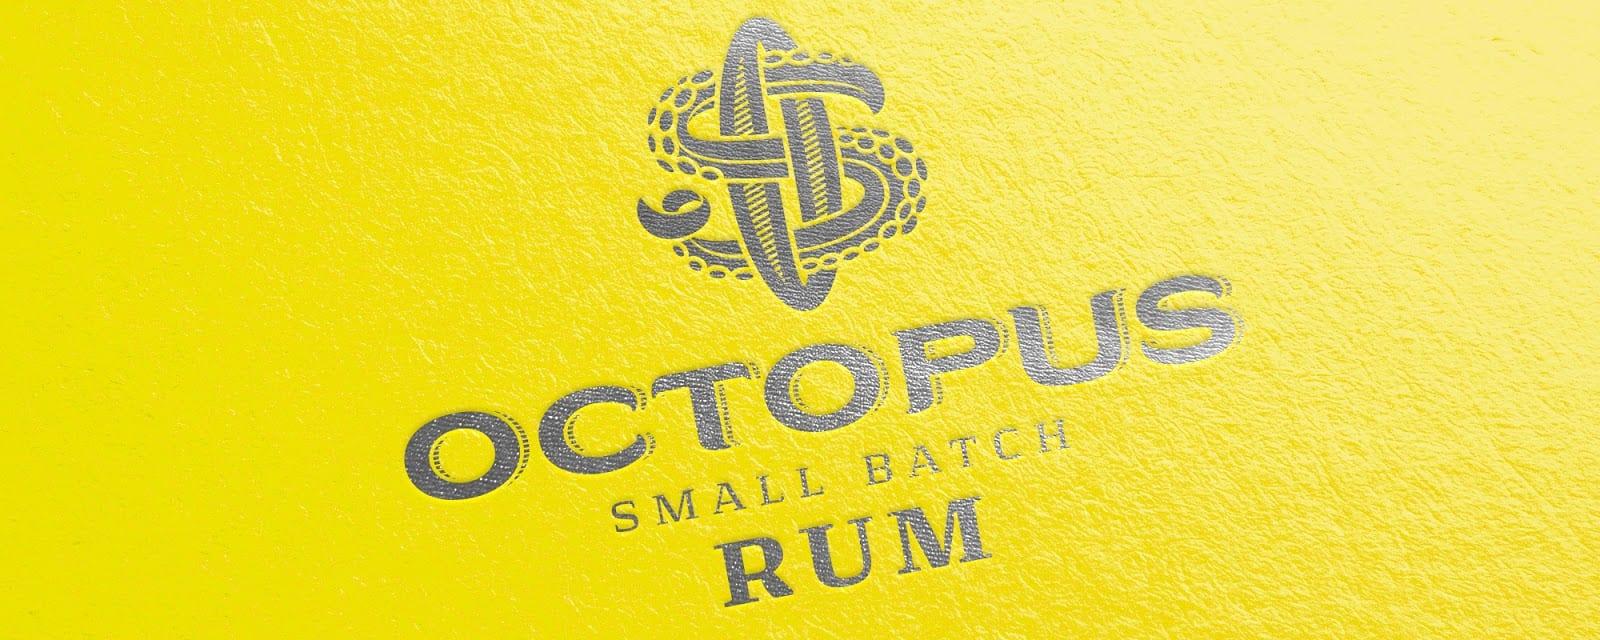 pavla.design octopus 03 - Ach, tie obaly - Octopus